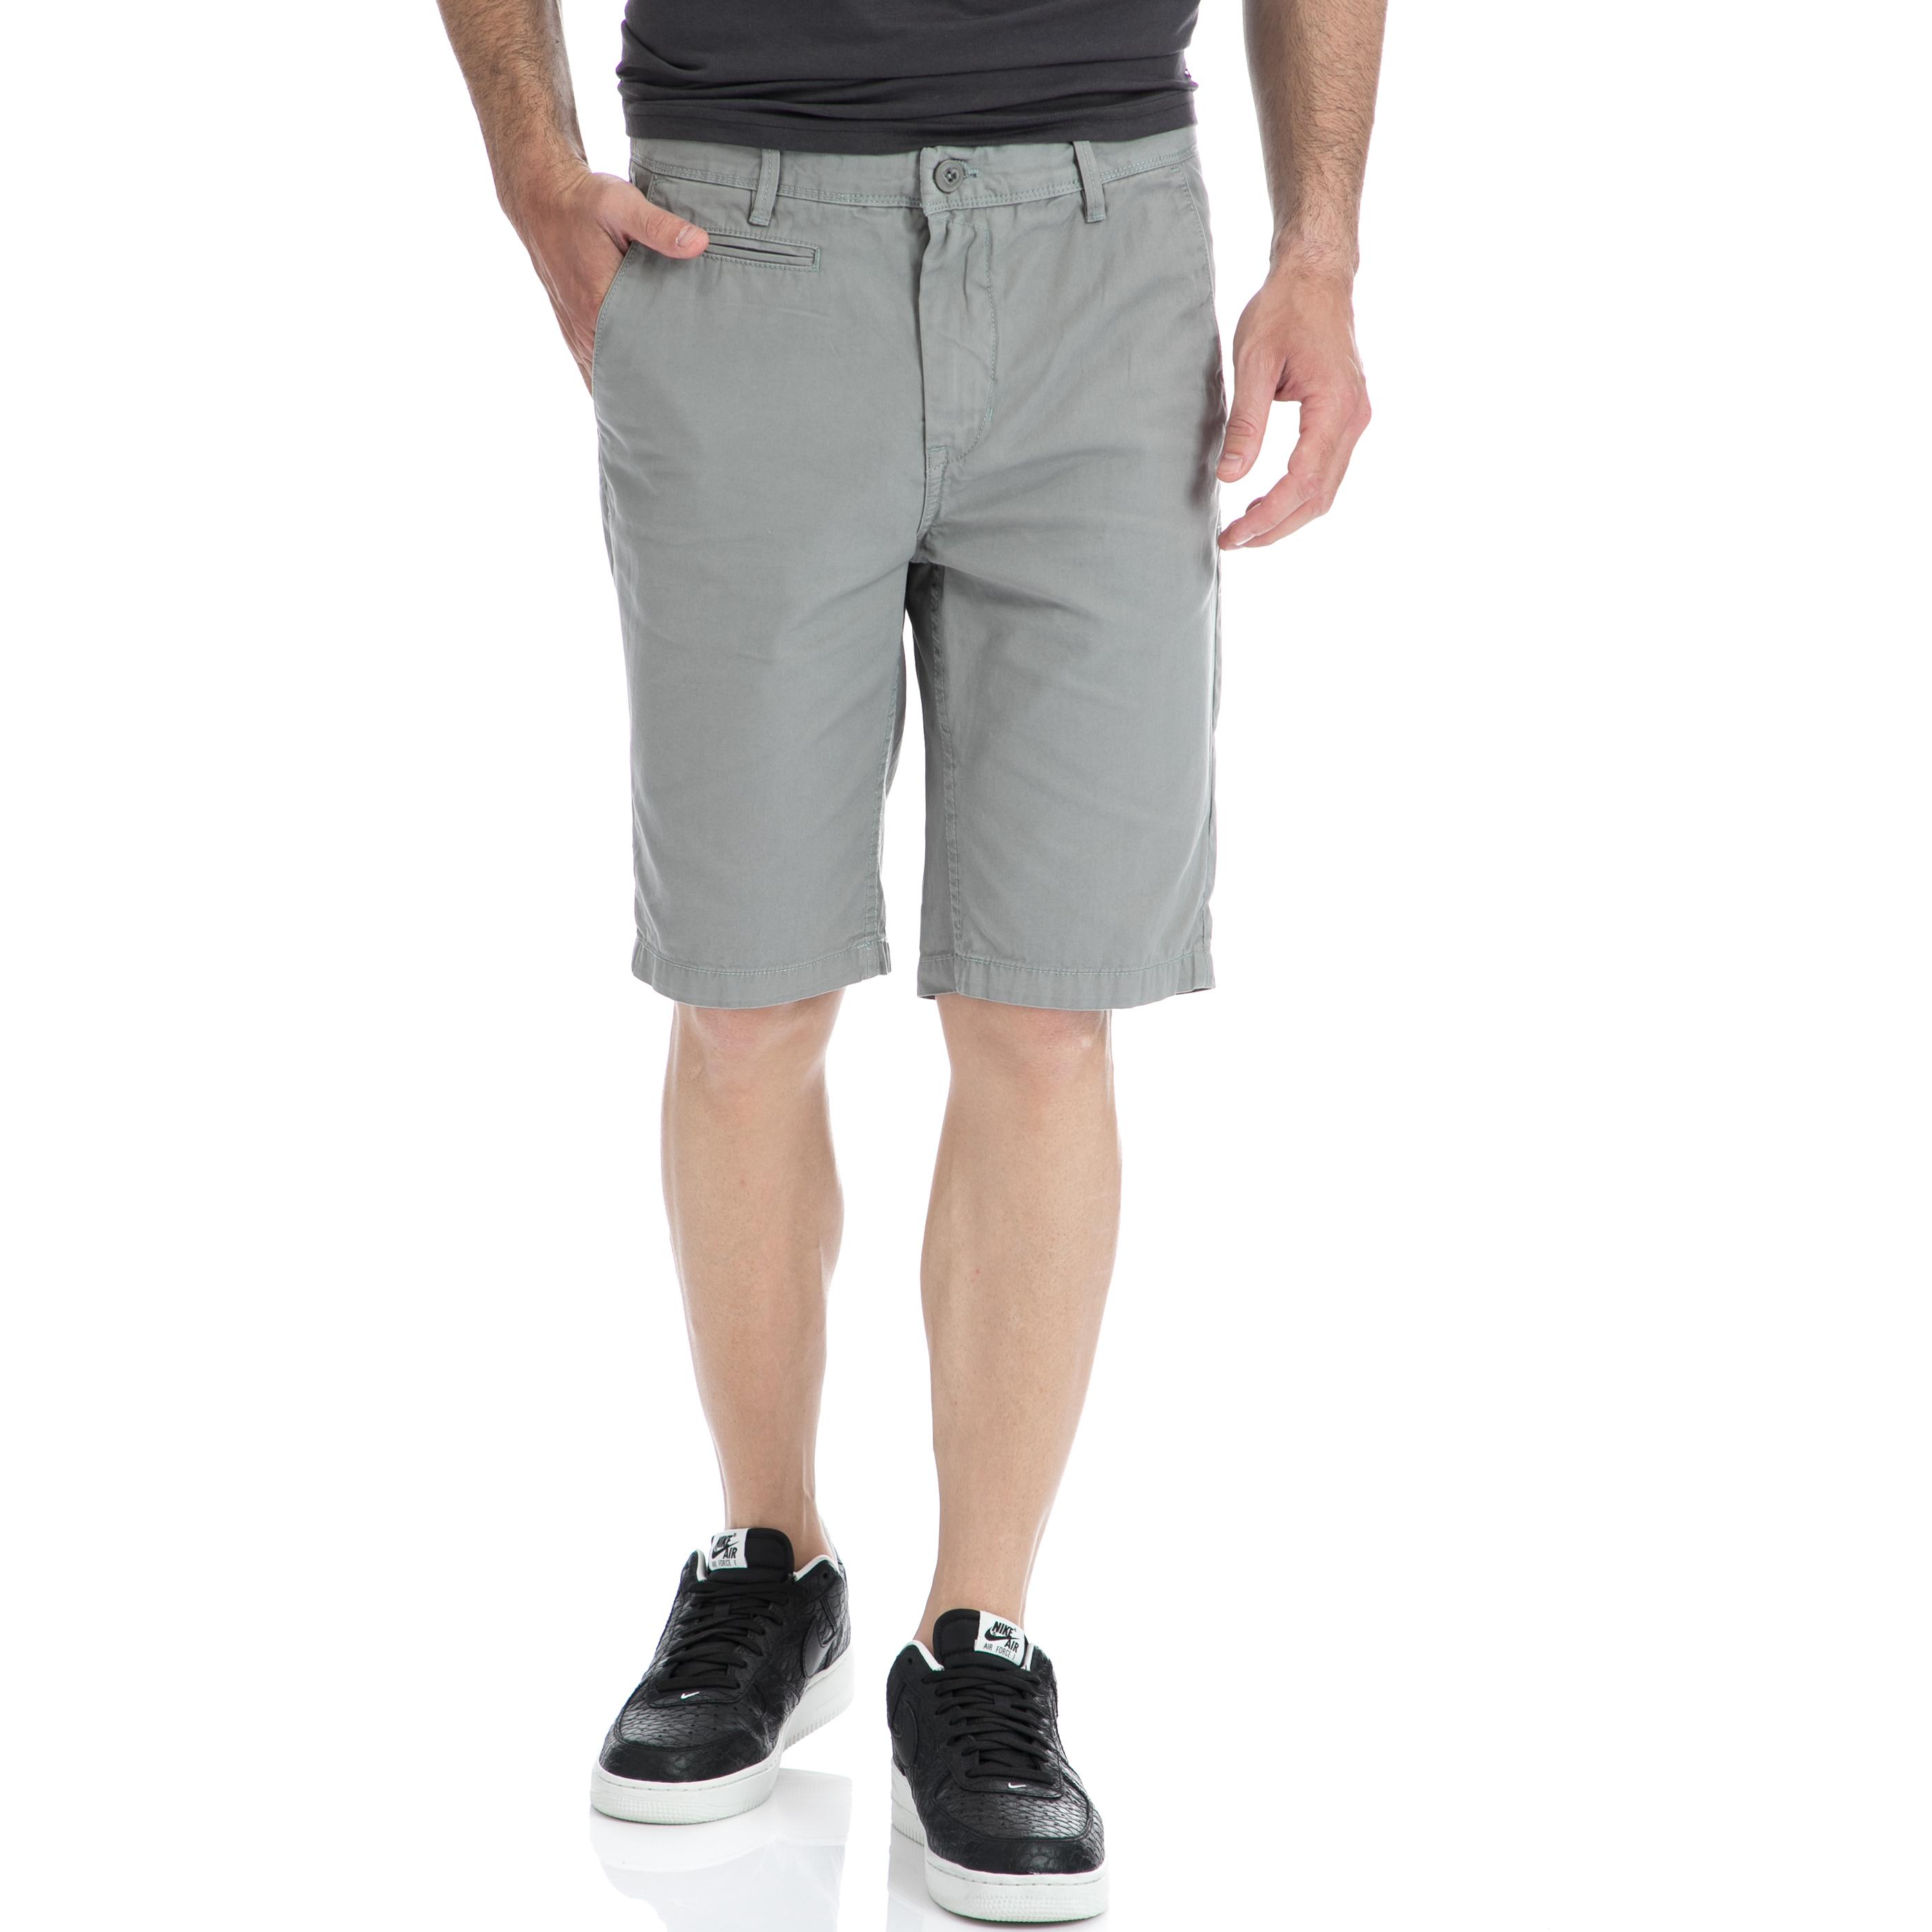 GARCIA JEANS - Αντρική βερμούδα Garcia Jeans γκρι ανδρικά ρούχα σορτς βερμούδες casual jean